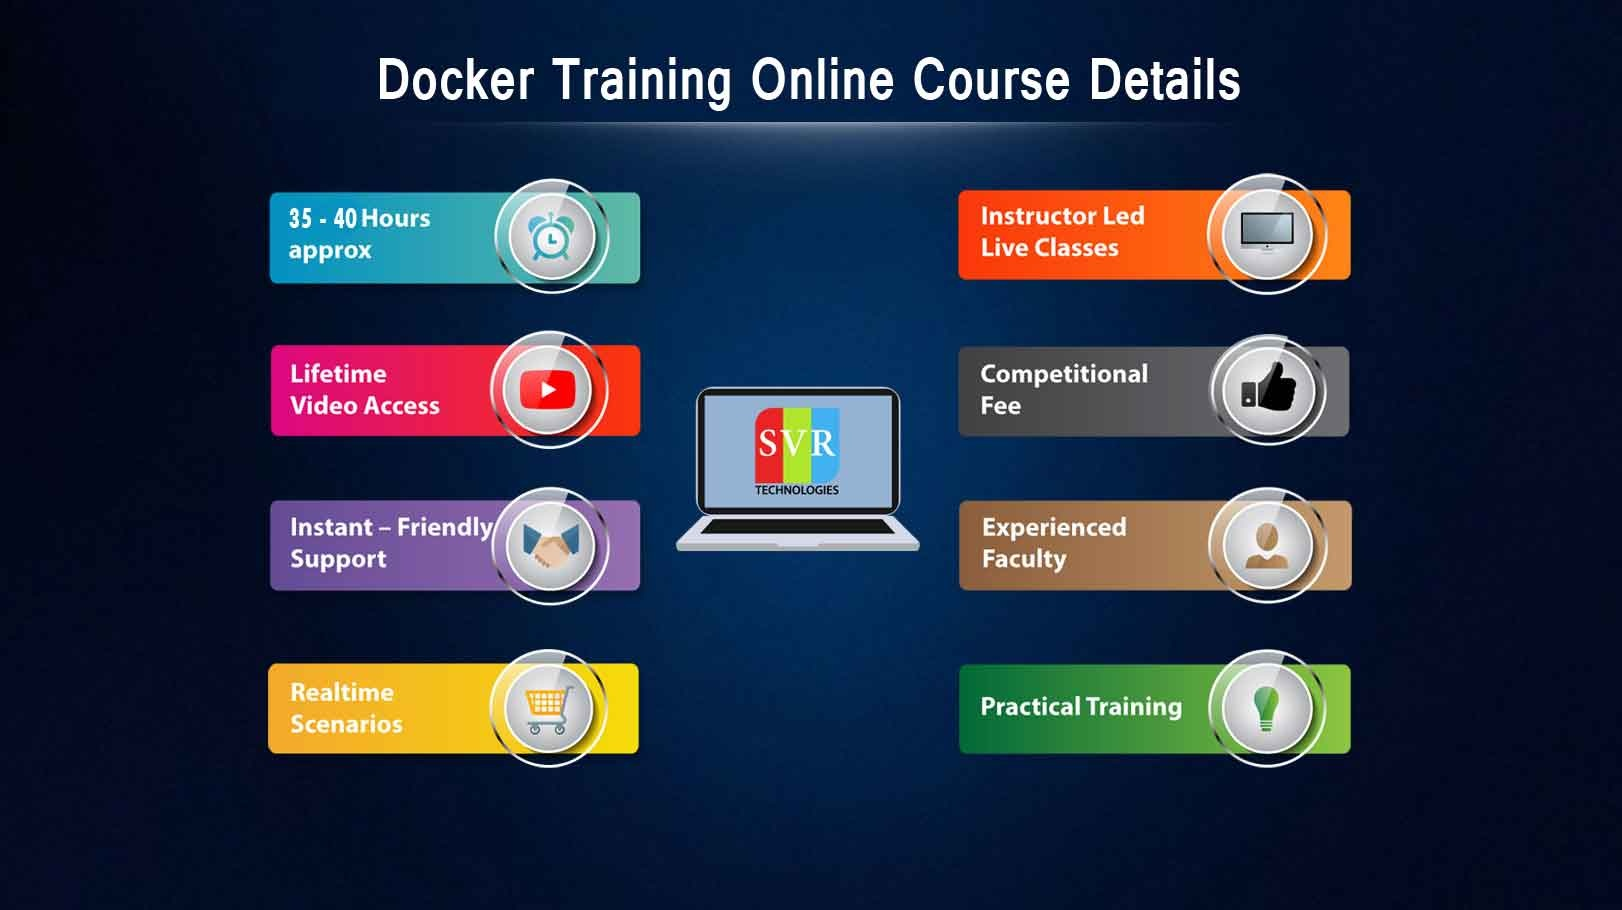 Where can I learn Docker? - Quora